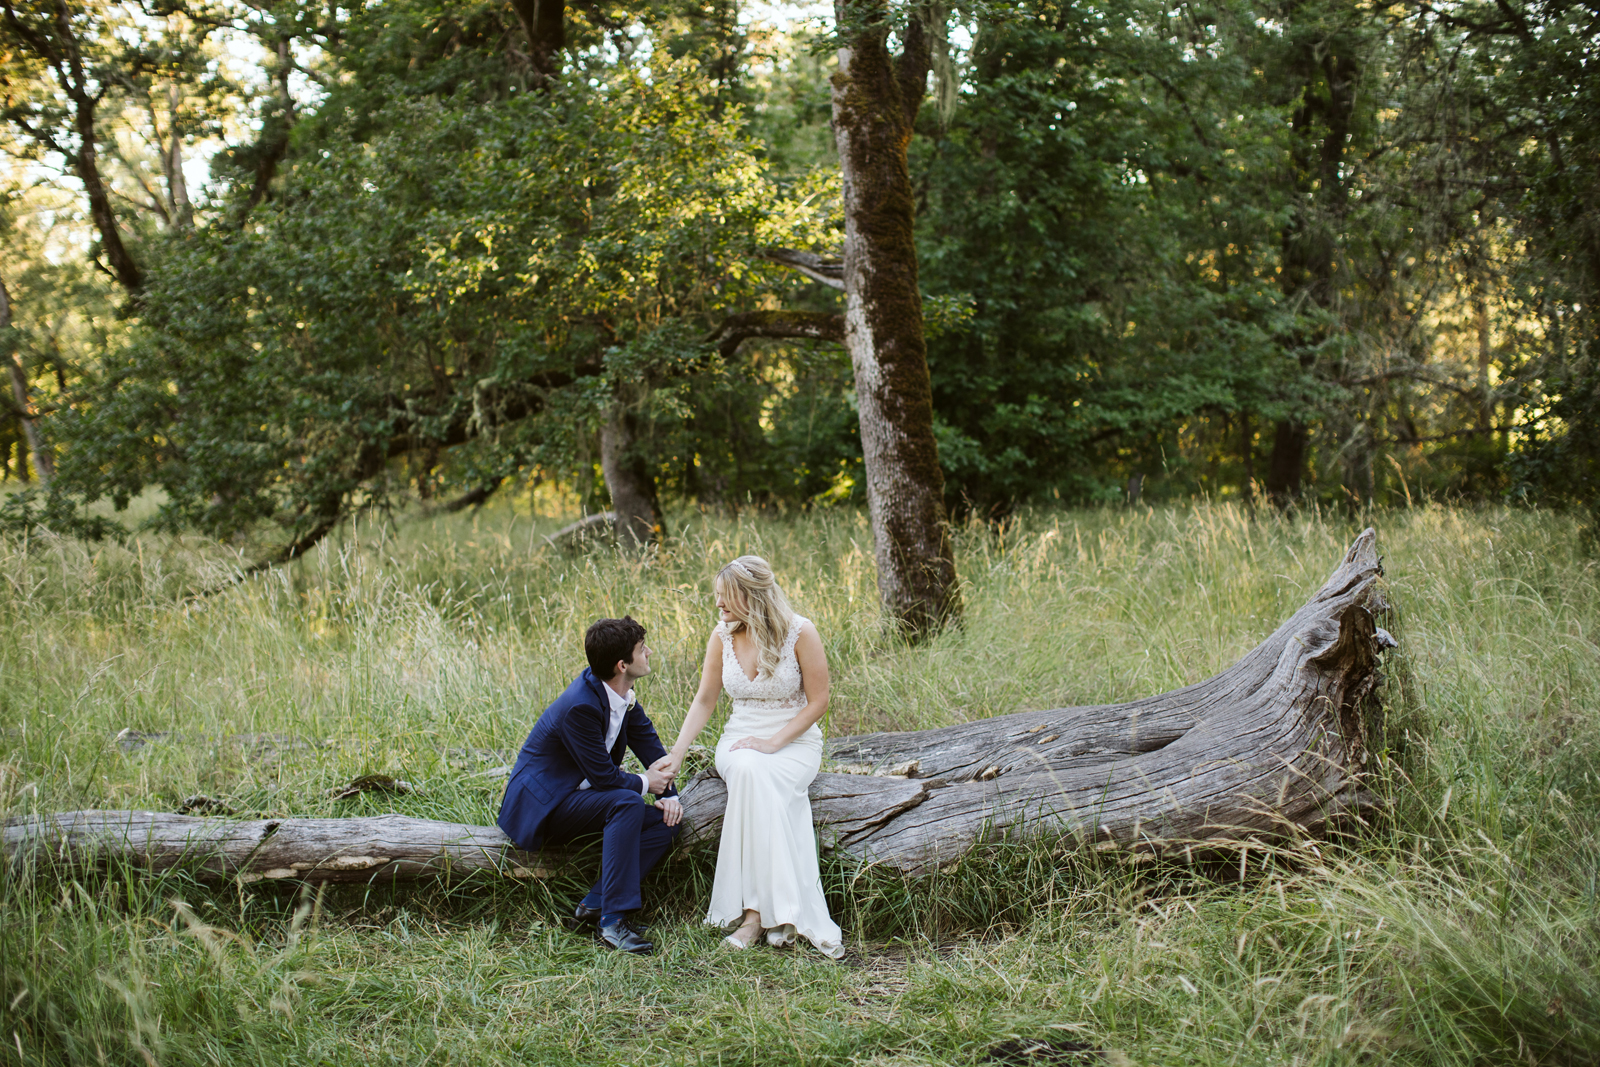 119-daronjackson-rachel-michael-wedding-mtpisgah.jpg